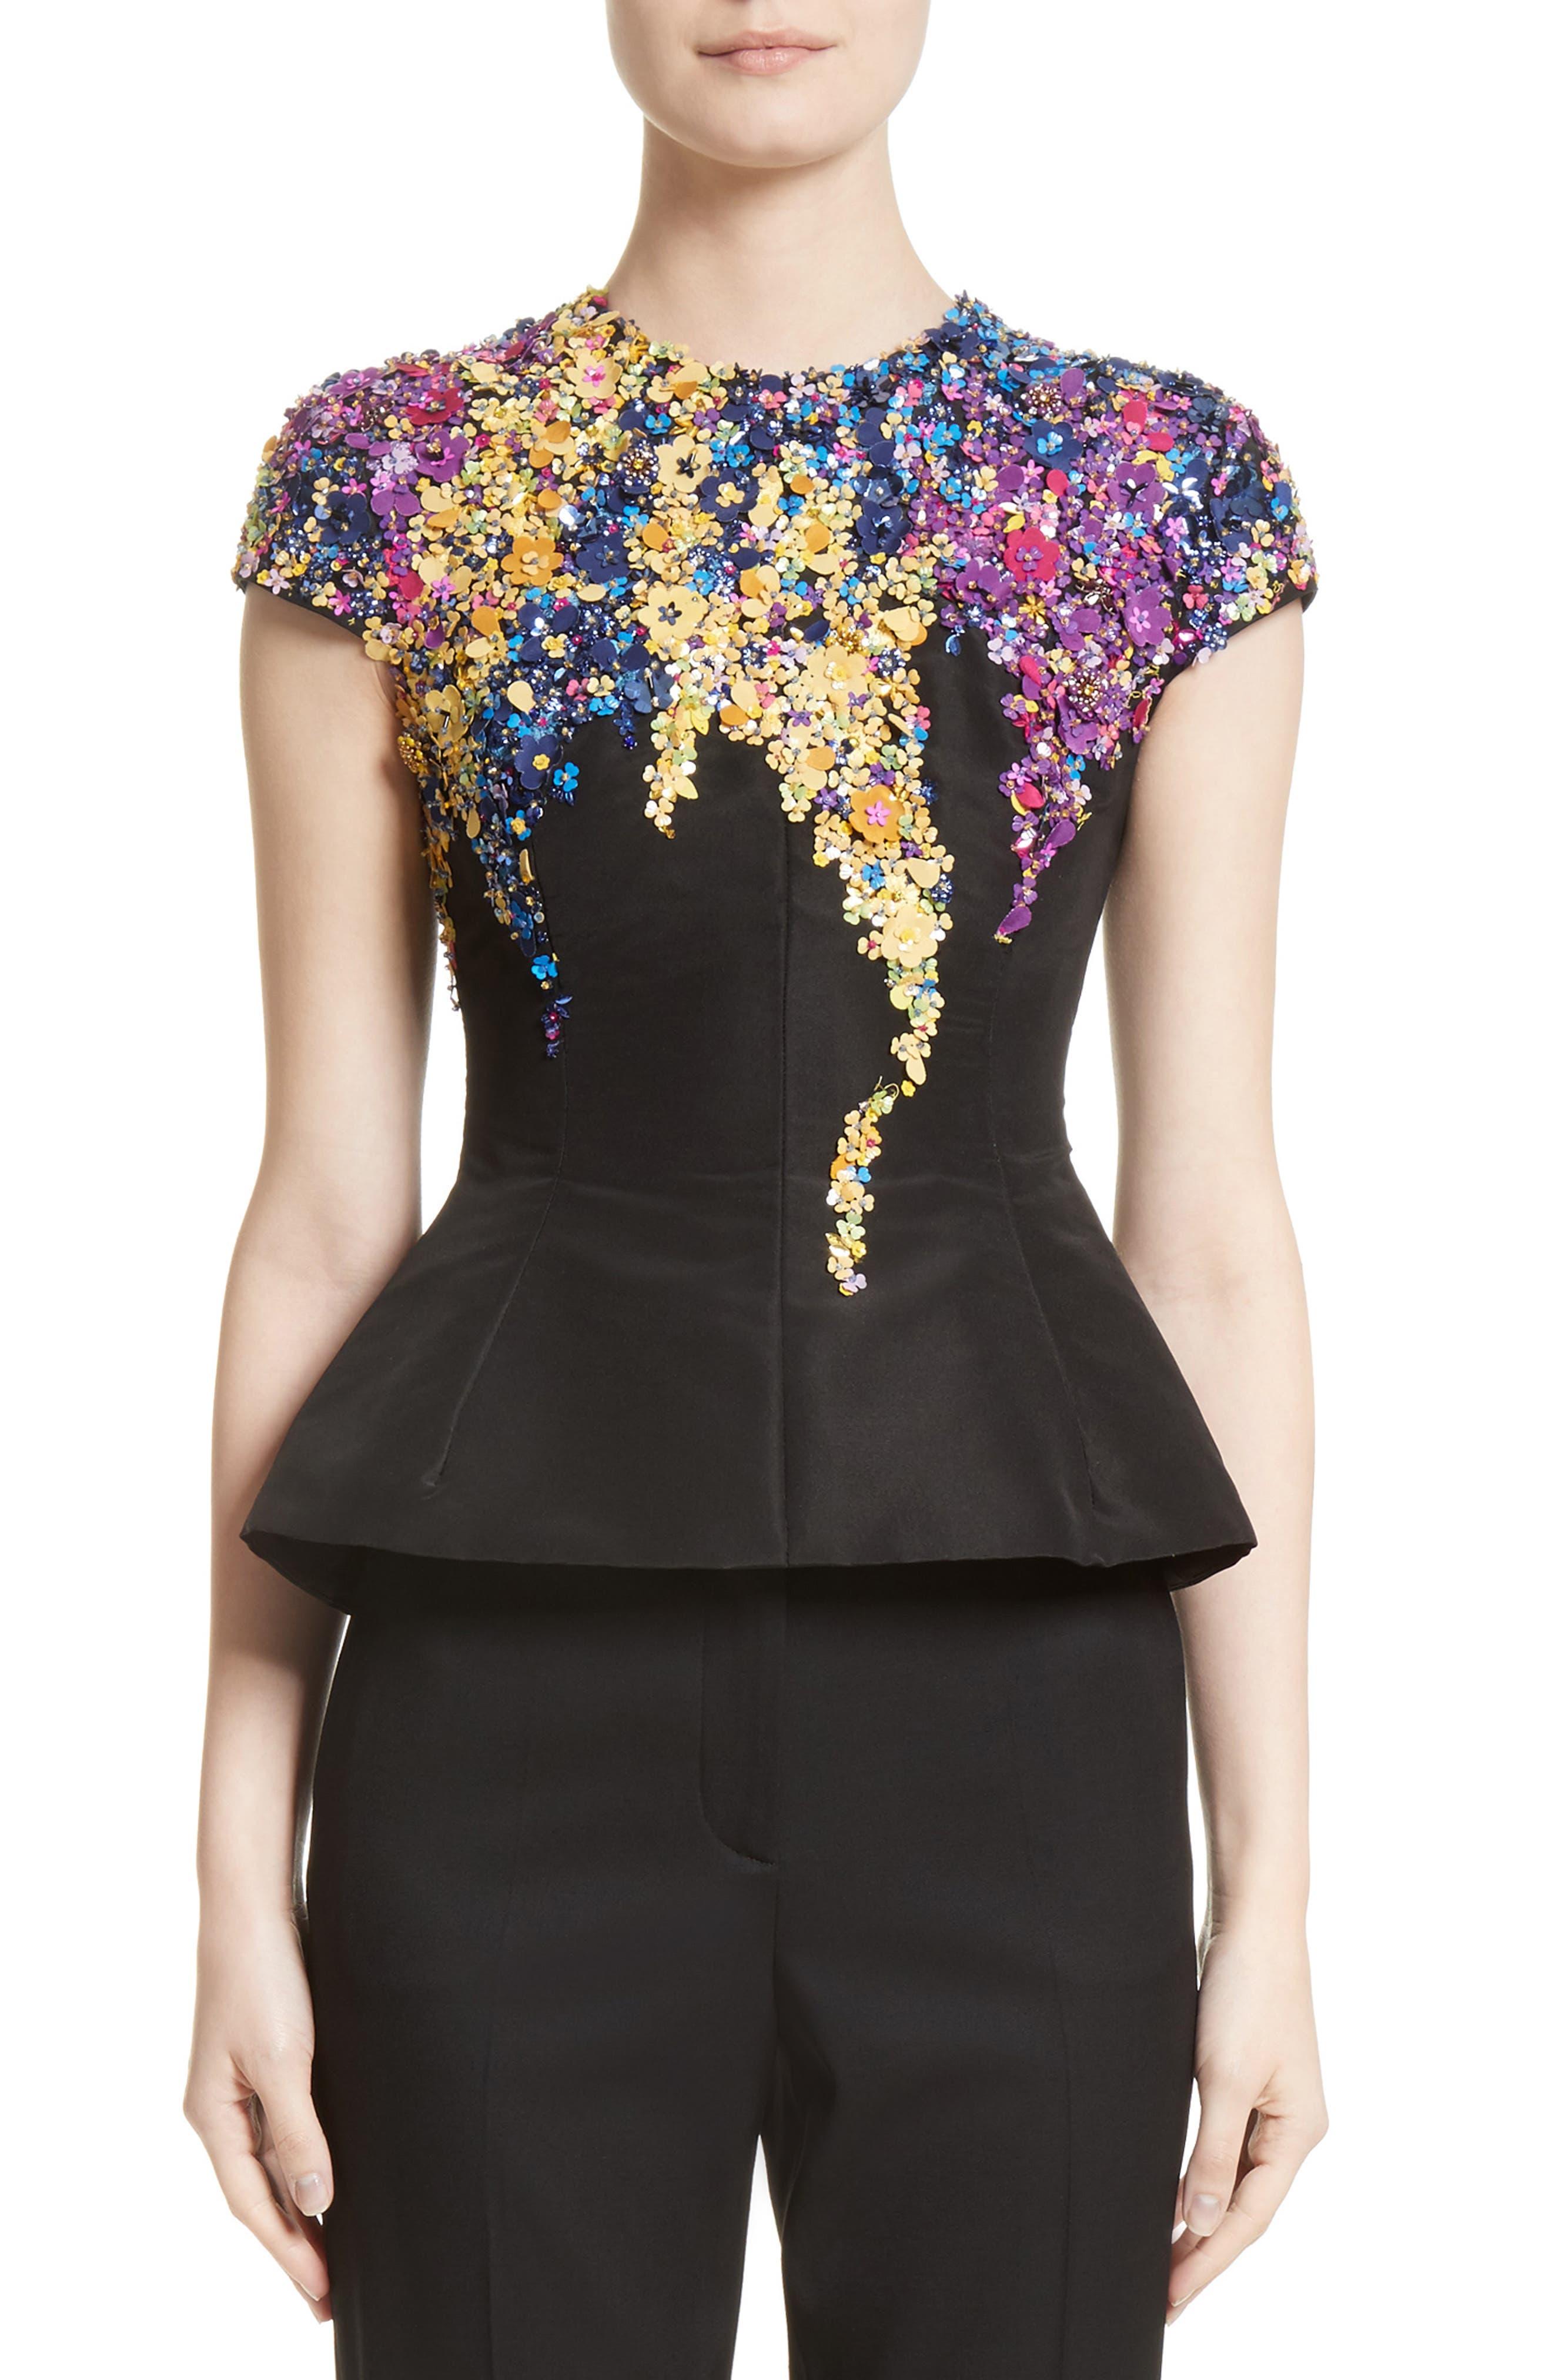 Main Image - Oscar de la Renta Tendrils Floral Embroidered Silk Faille Top